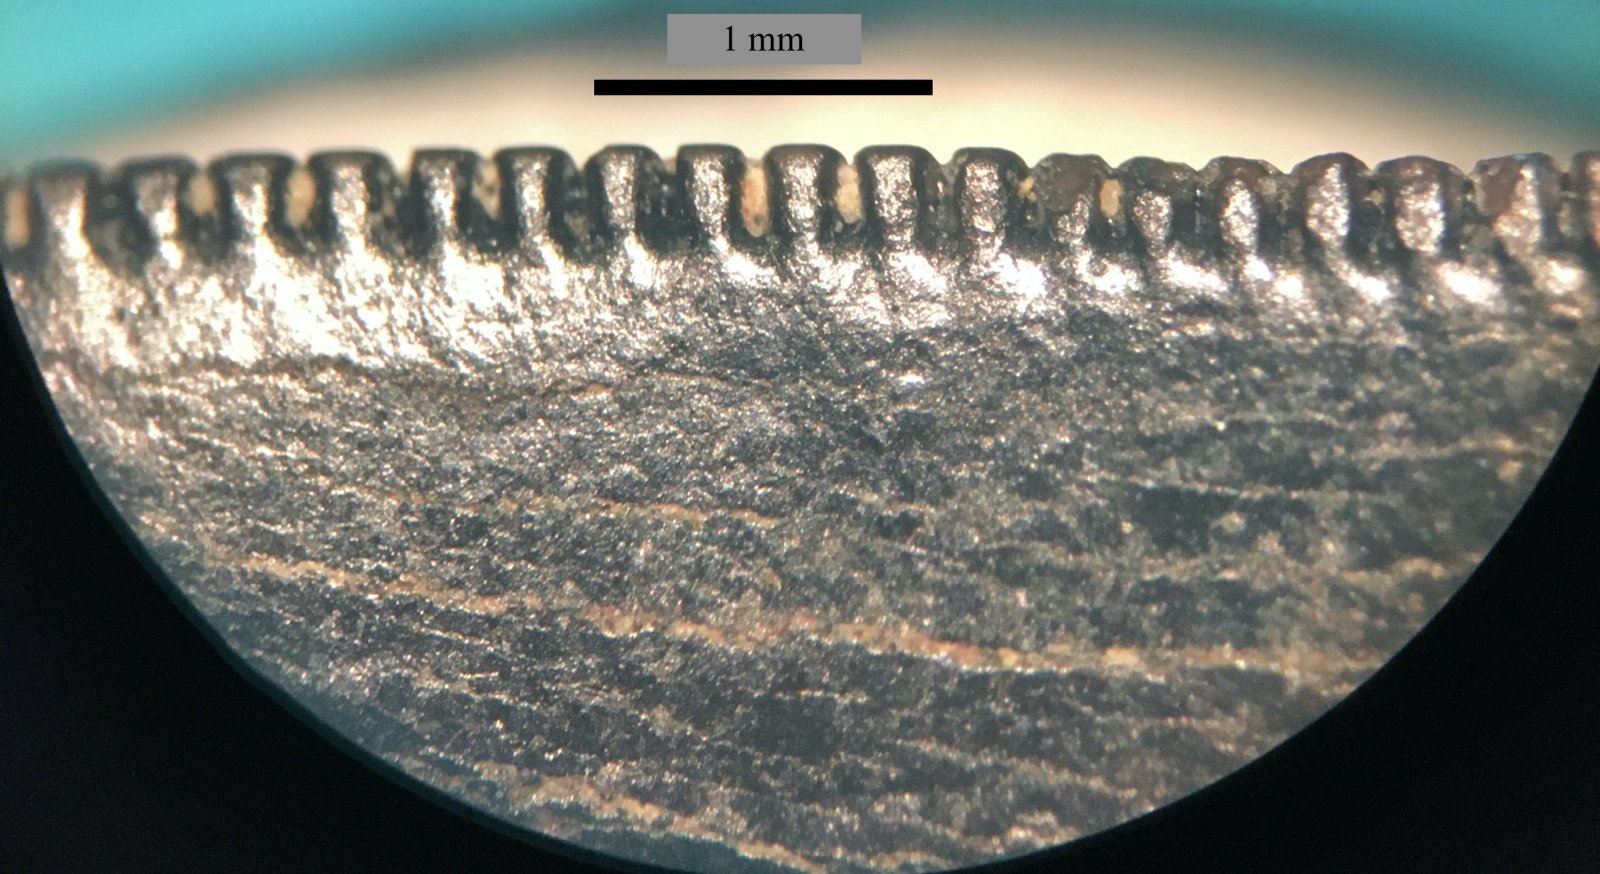 Juvenile T. rex distal serrations